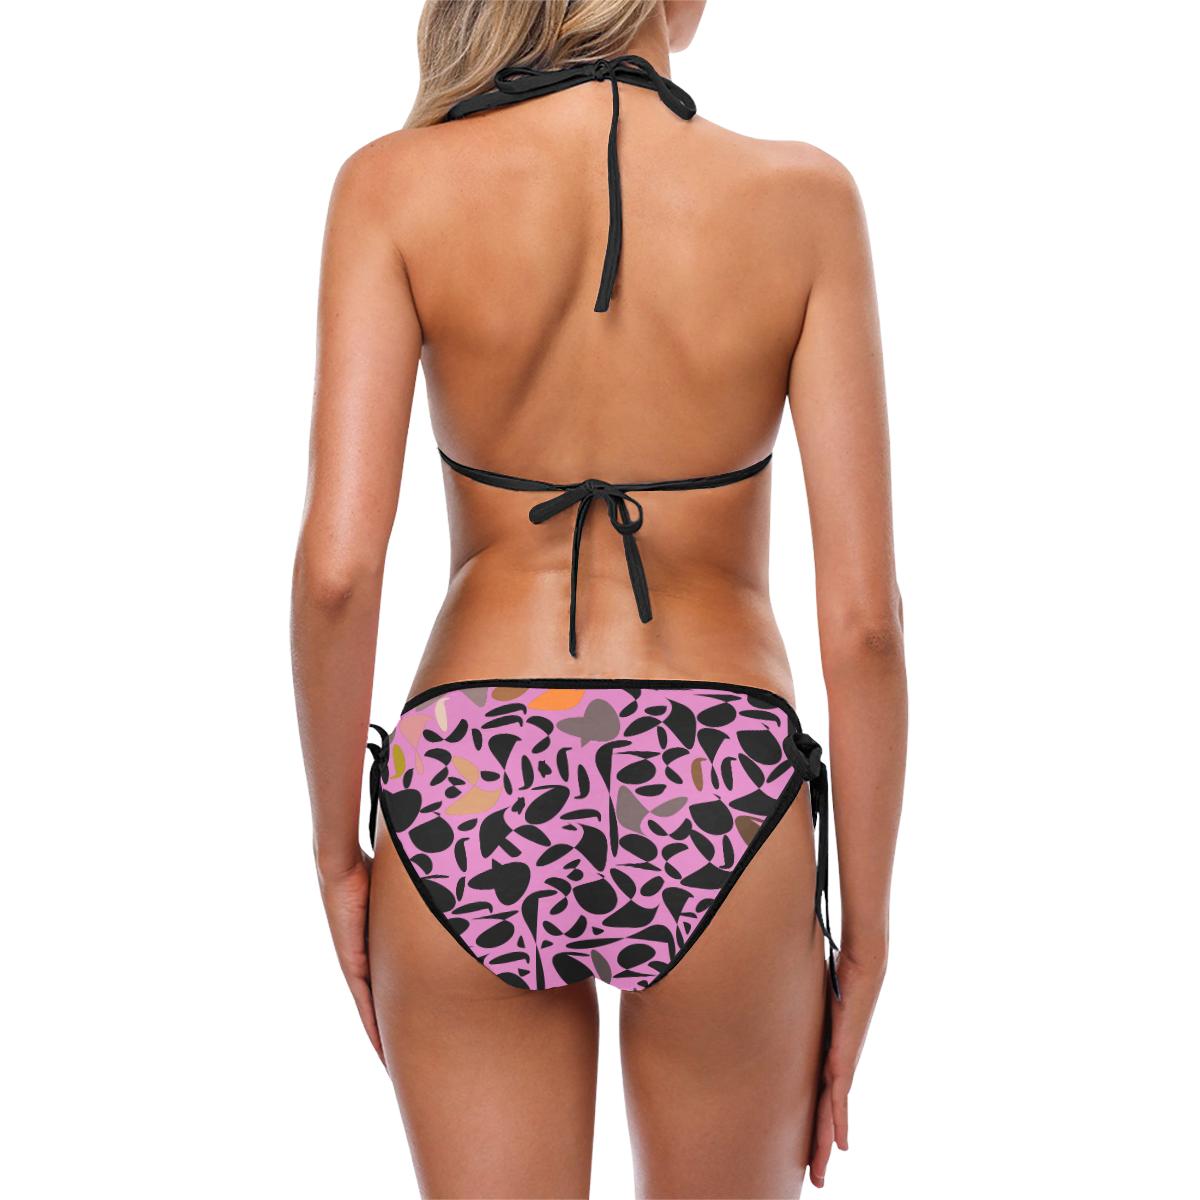 zappwaits u2 Custom Bikini Swimsuit (Model S01)